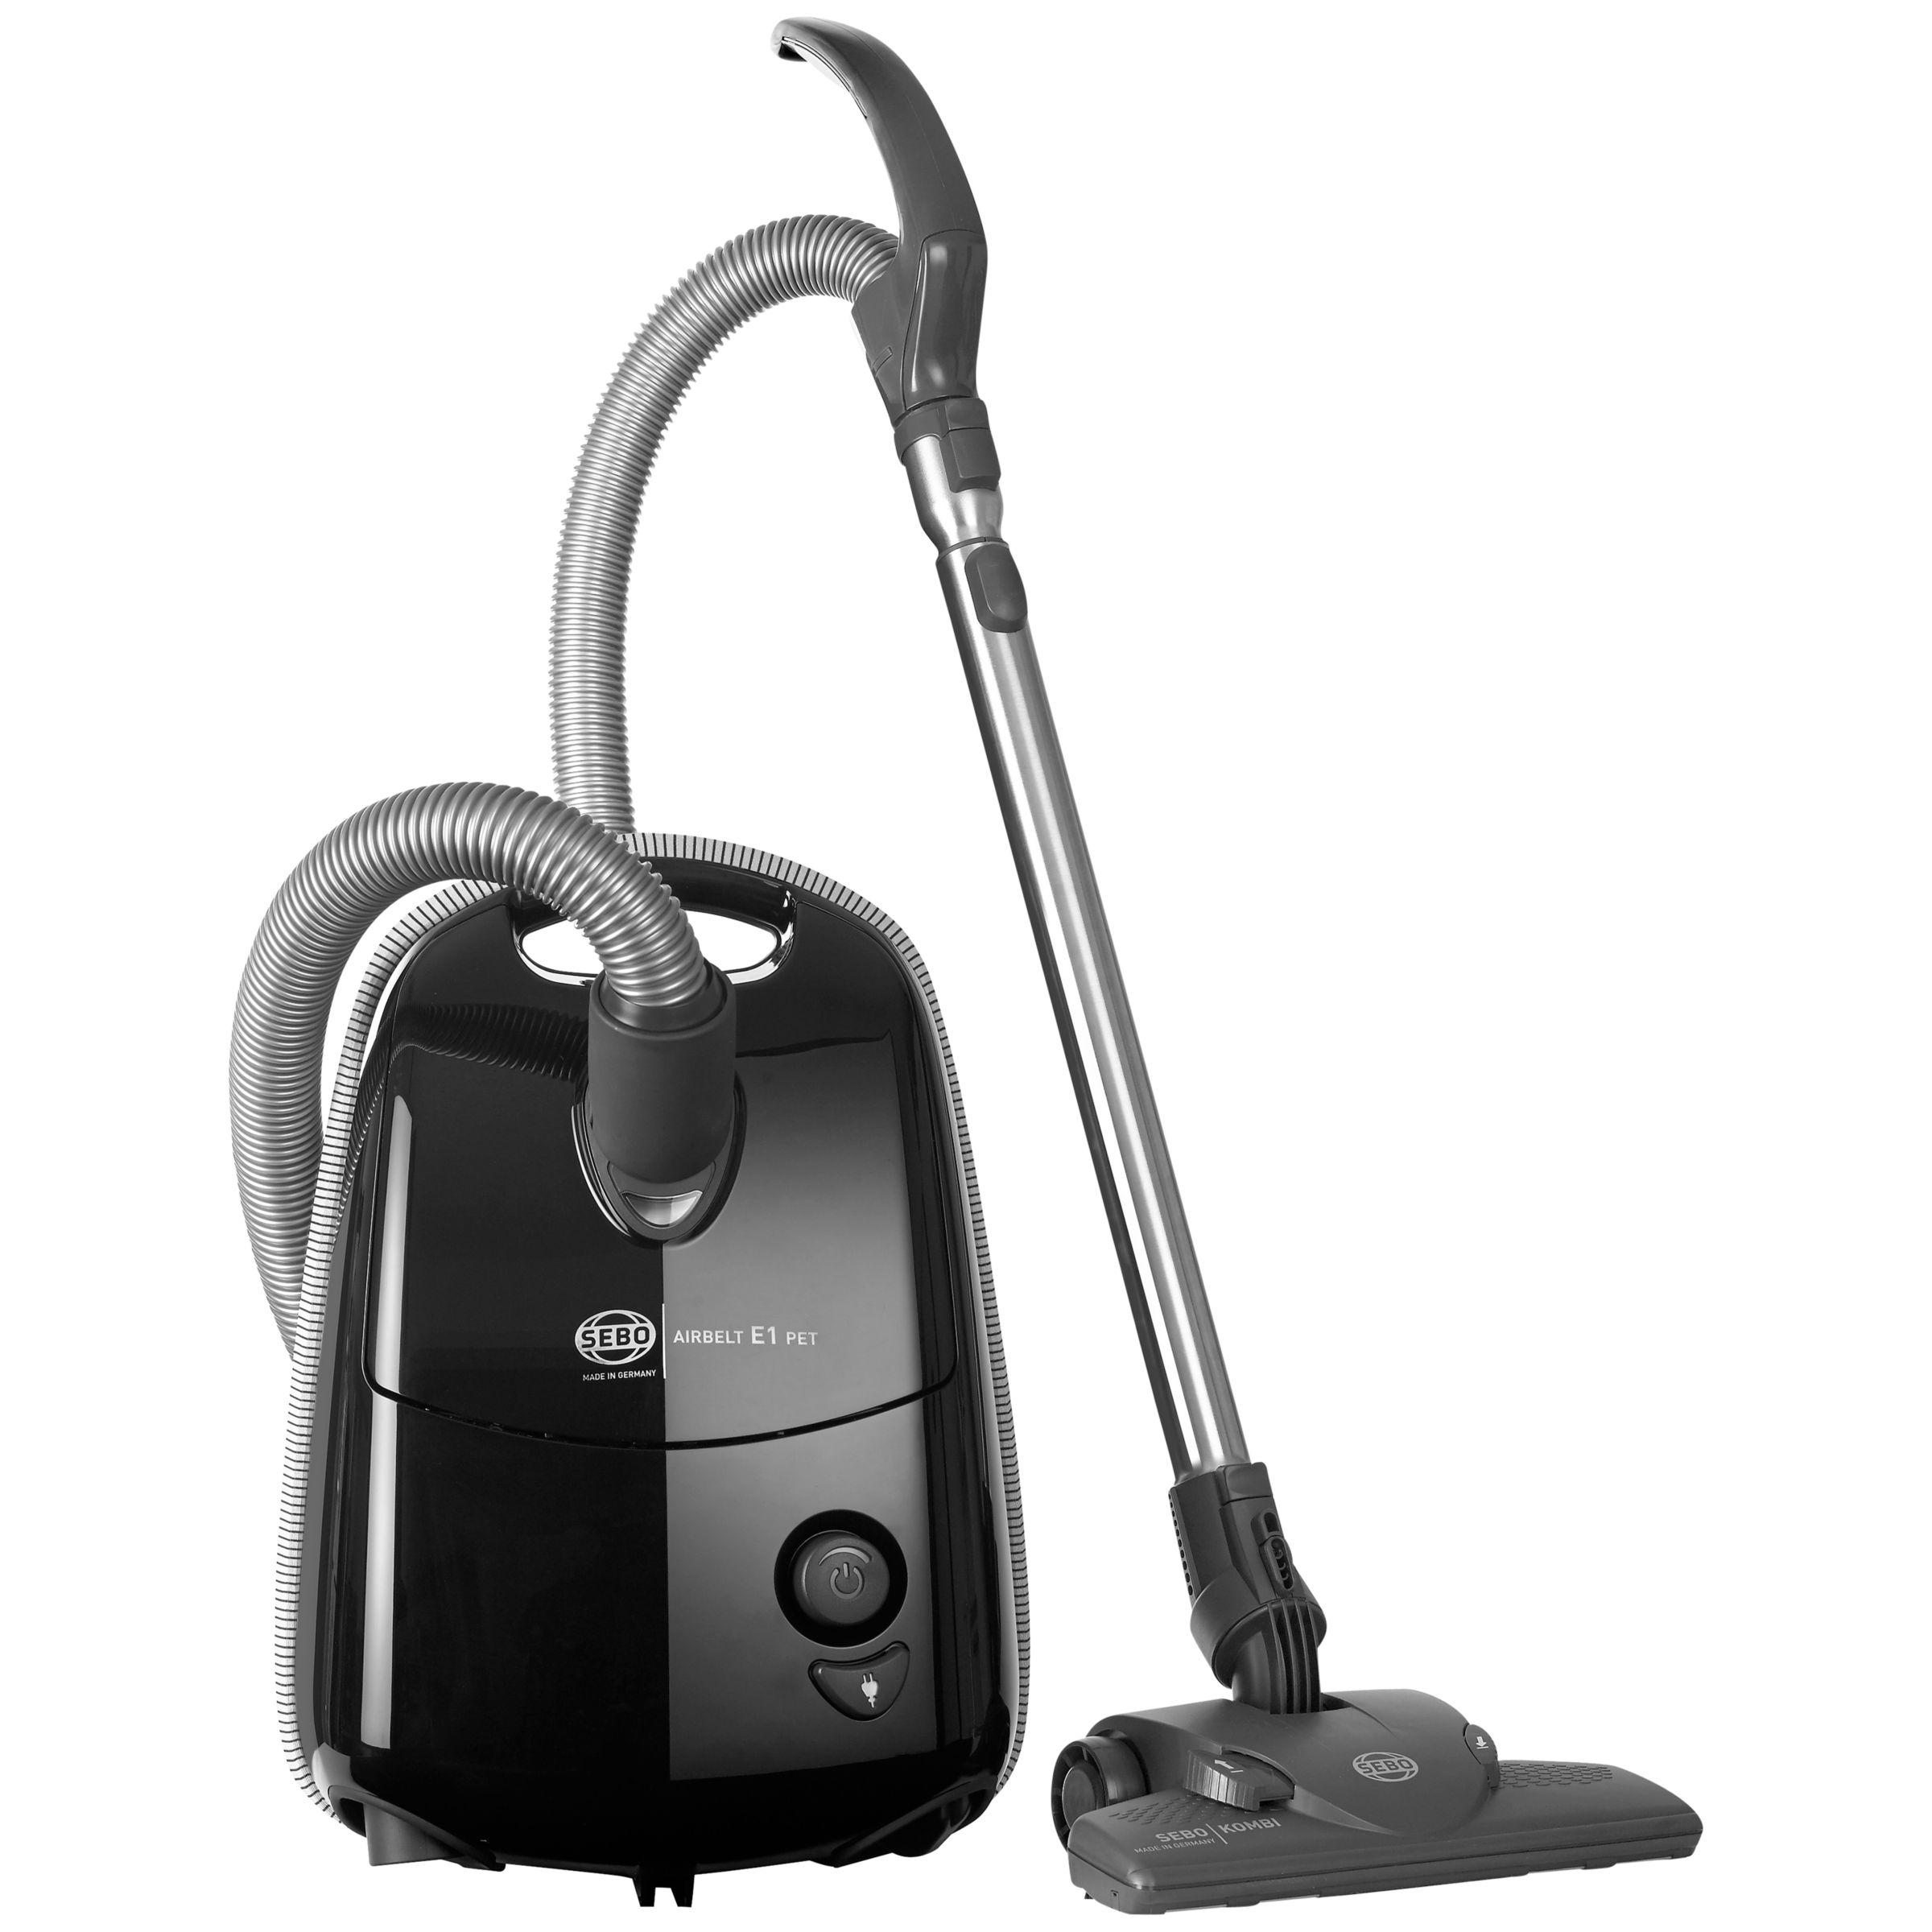 Sebo Sebo 91604GB Airbelt E1 Pet Cylinder Vacuum Cleaner, Onyx Black